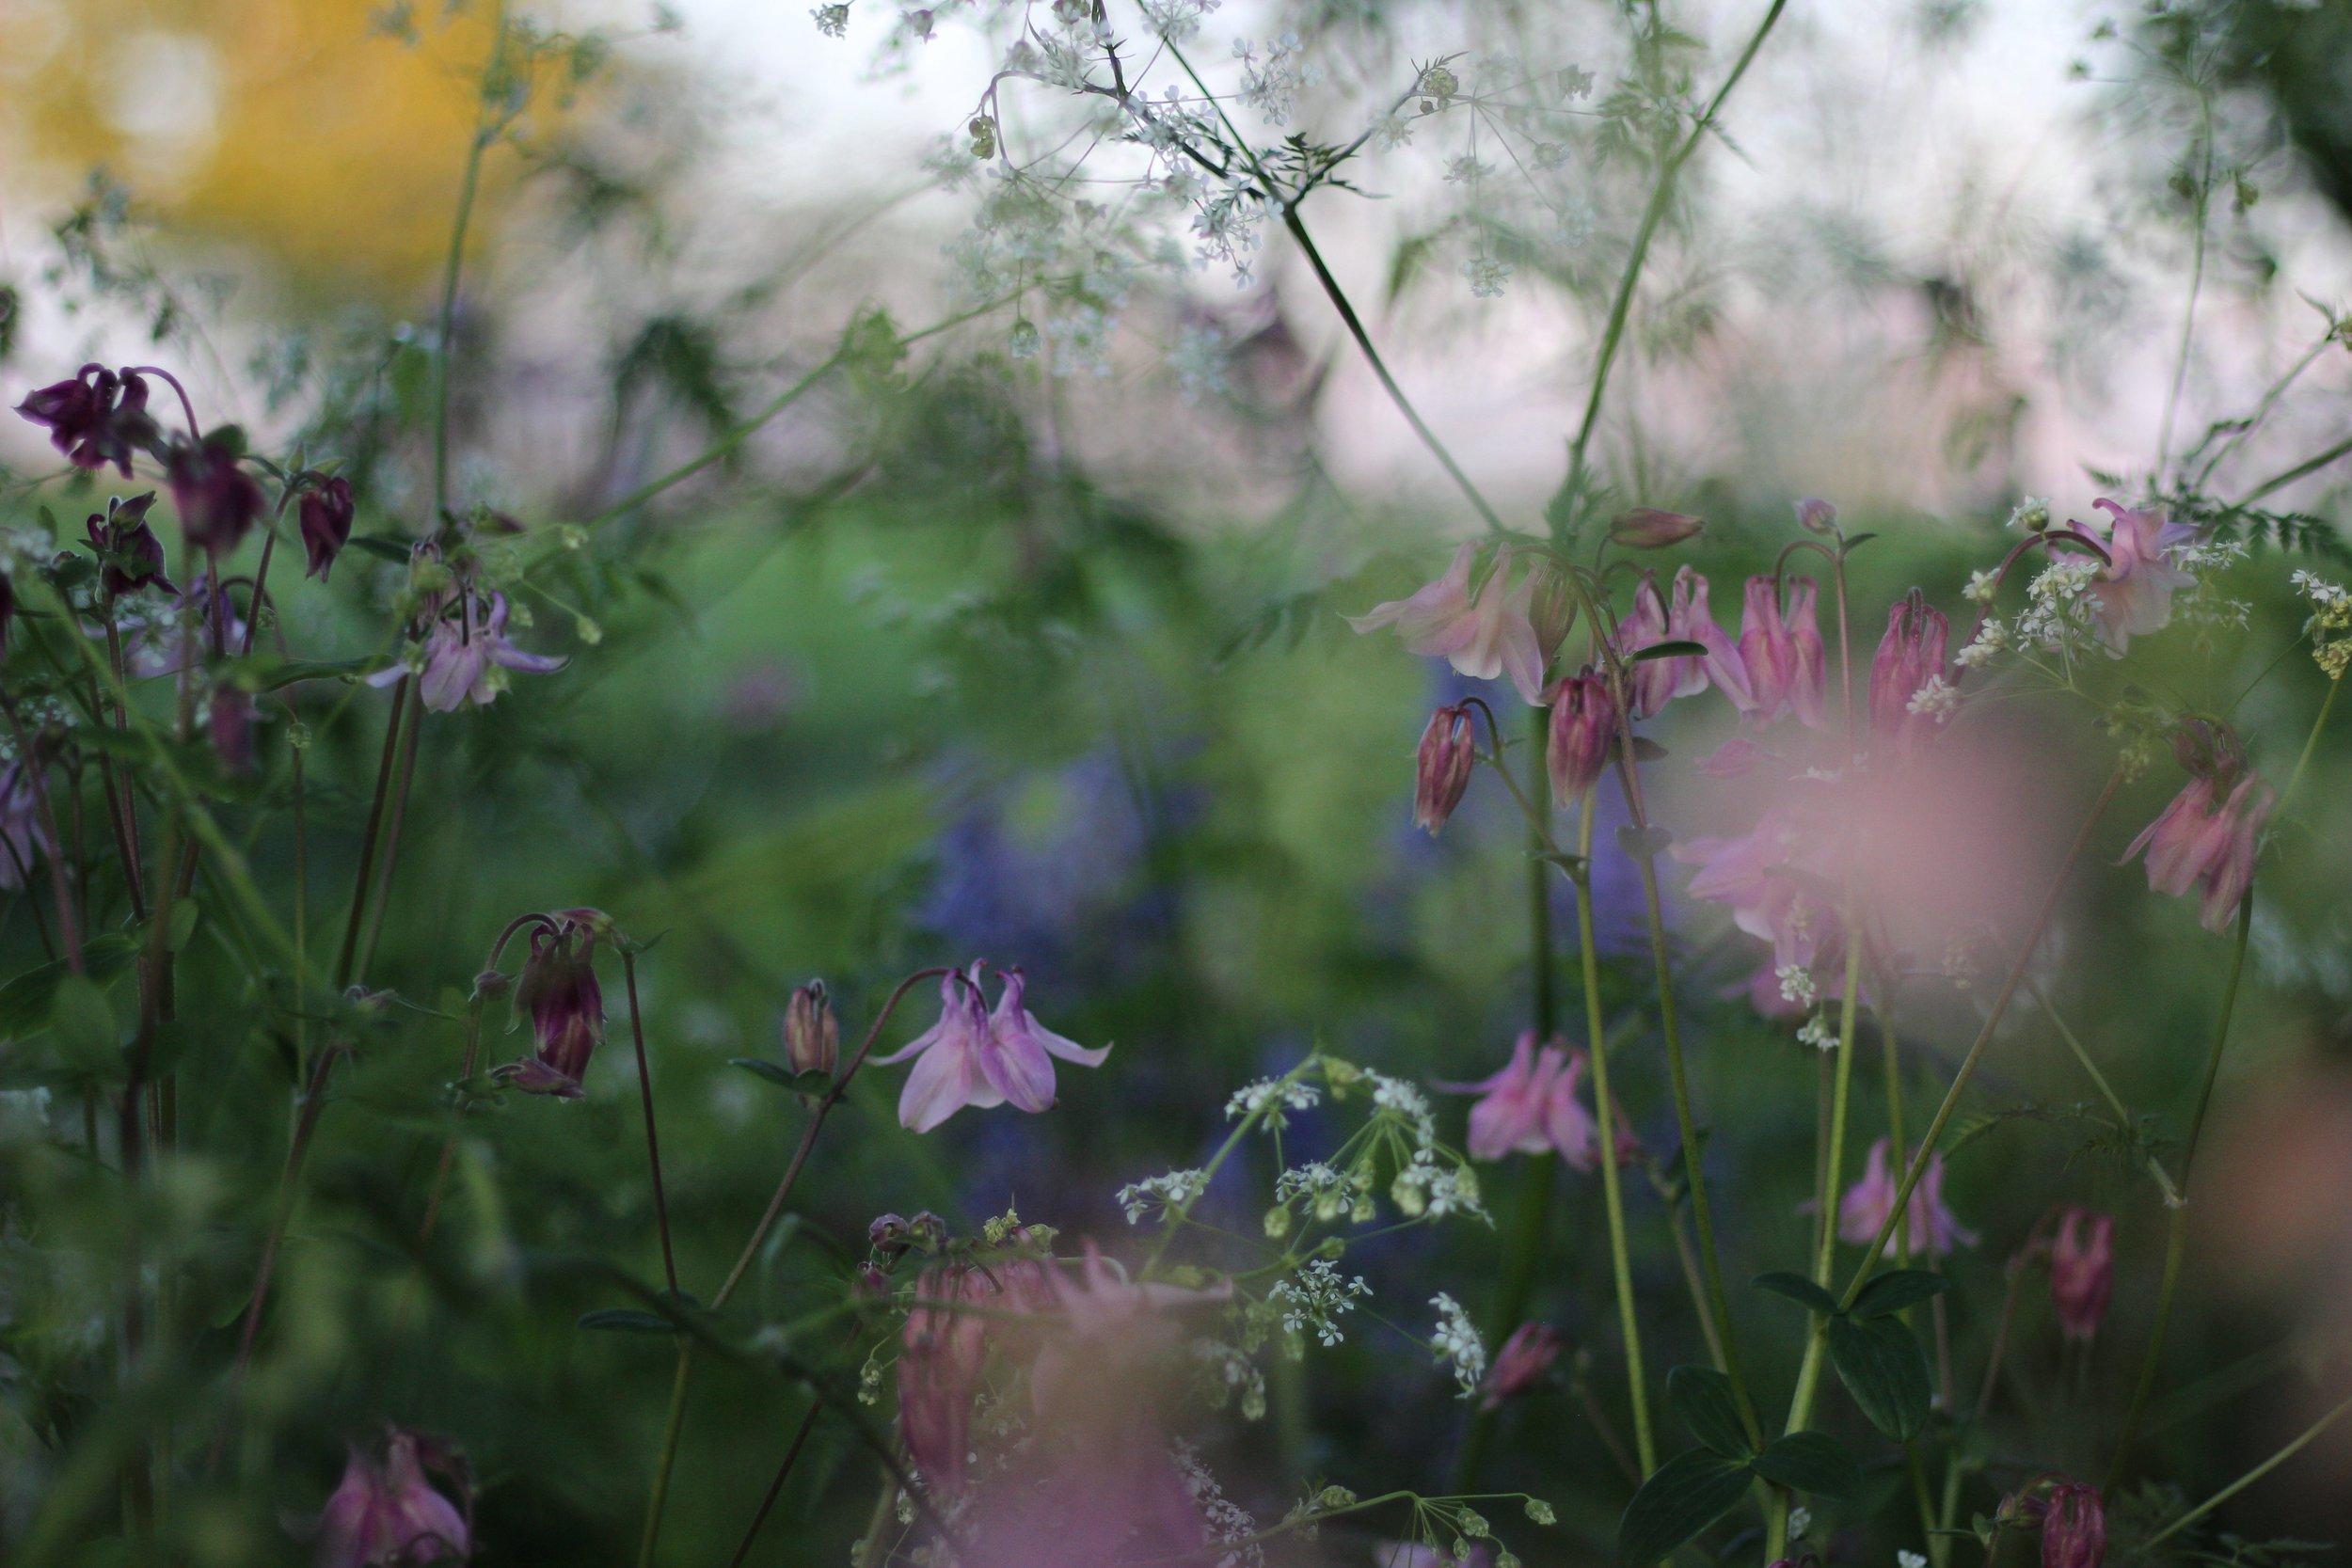 Wild Flowers in Spring | Field + Nest